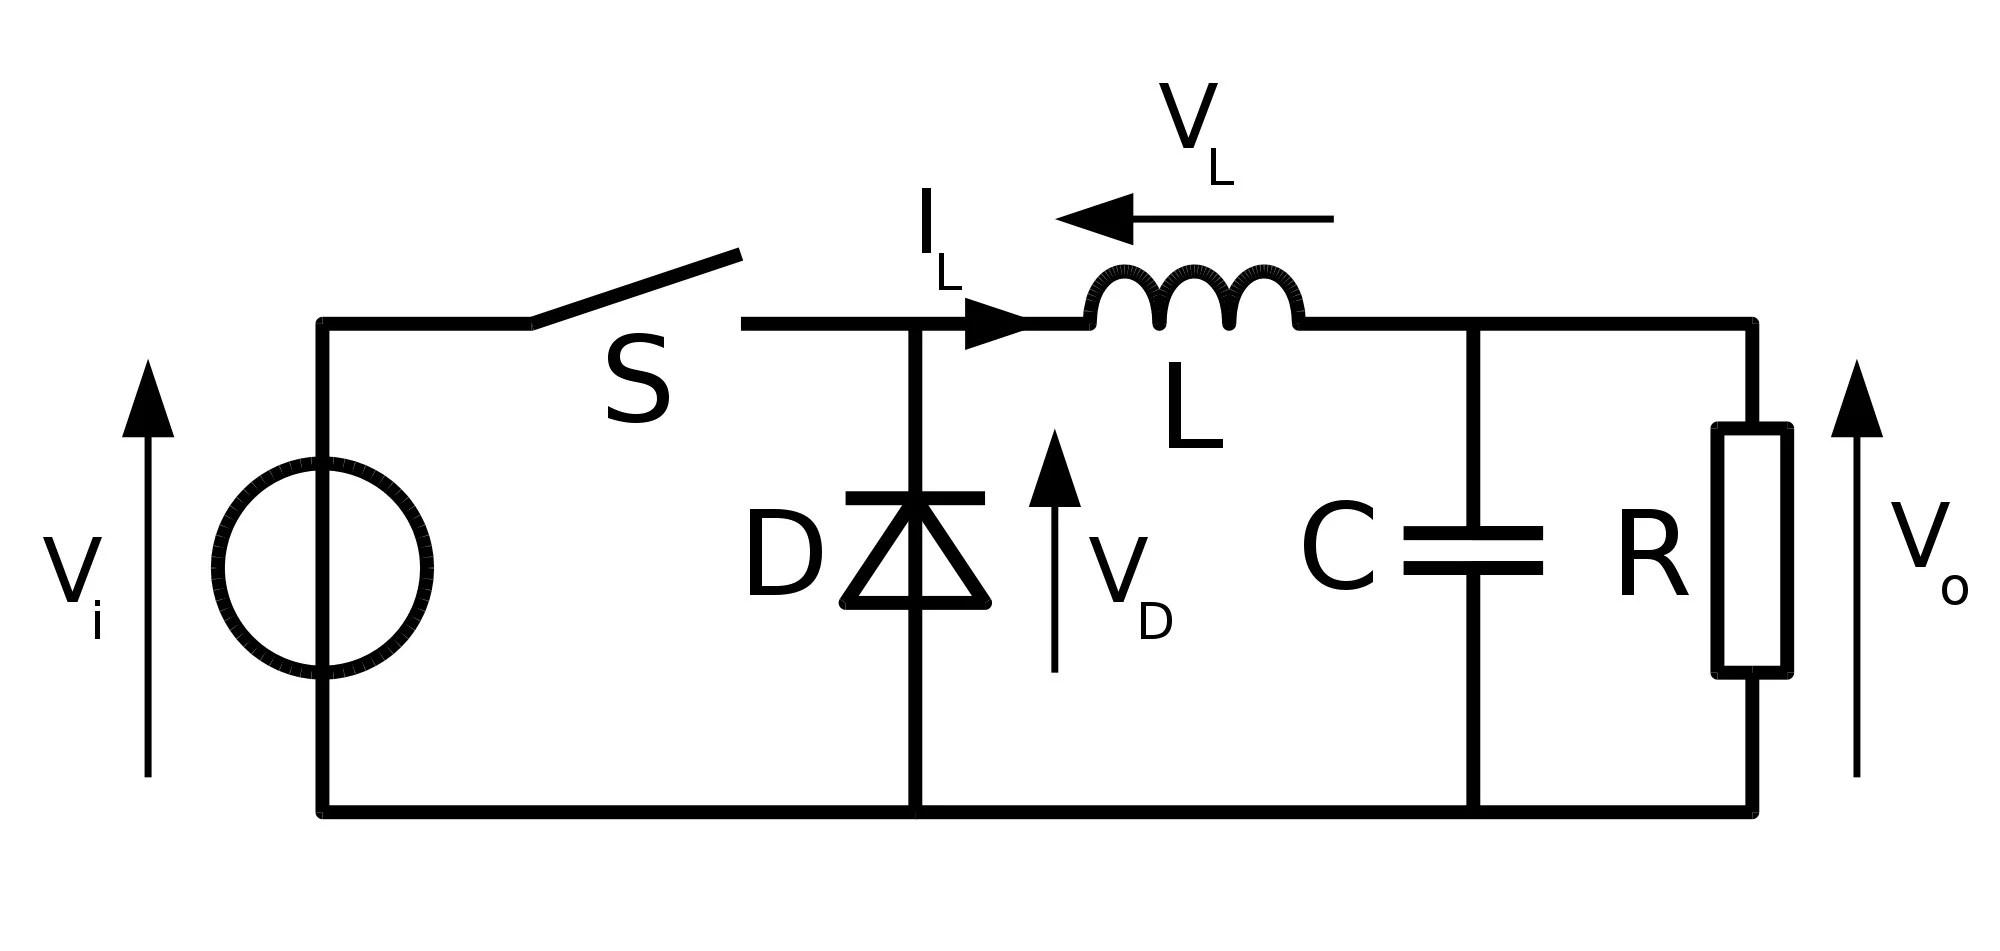 C Biscuit Power 5v 3a Buck Regulator For Wandboard